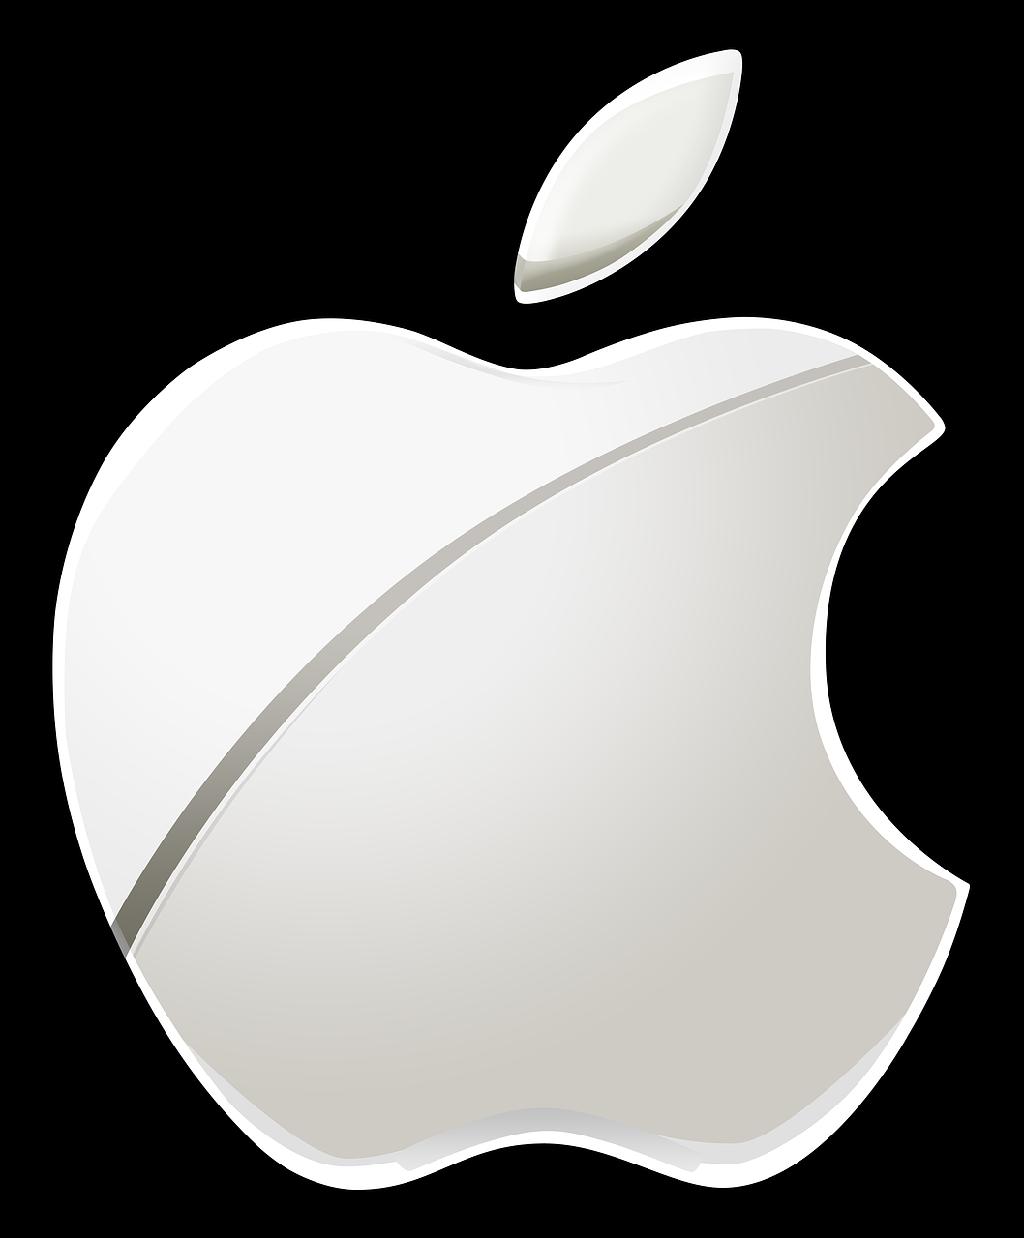 Apple logo PNG images free download.